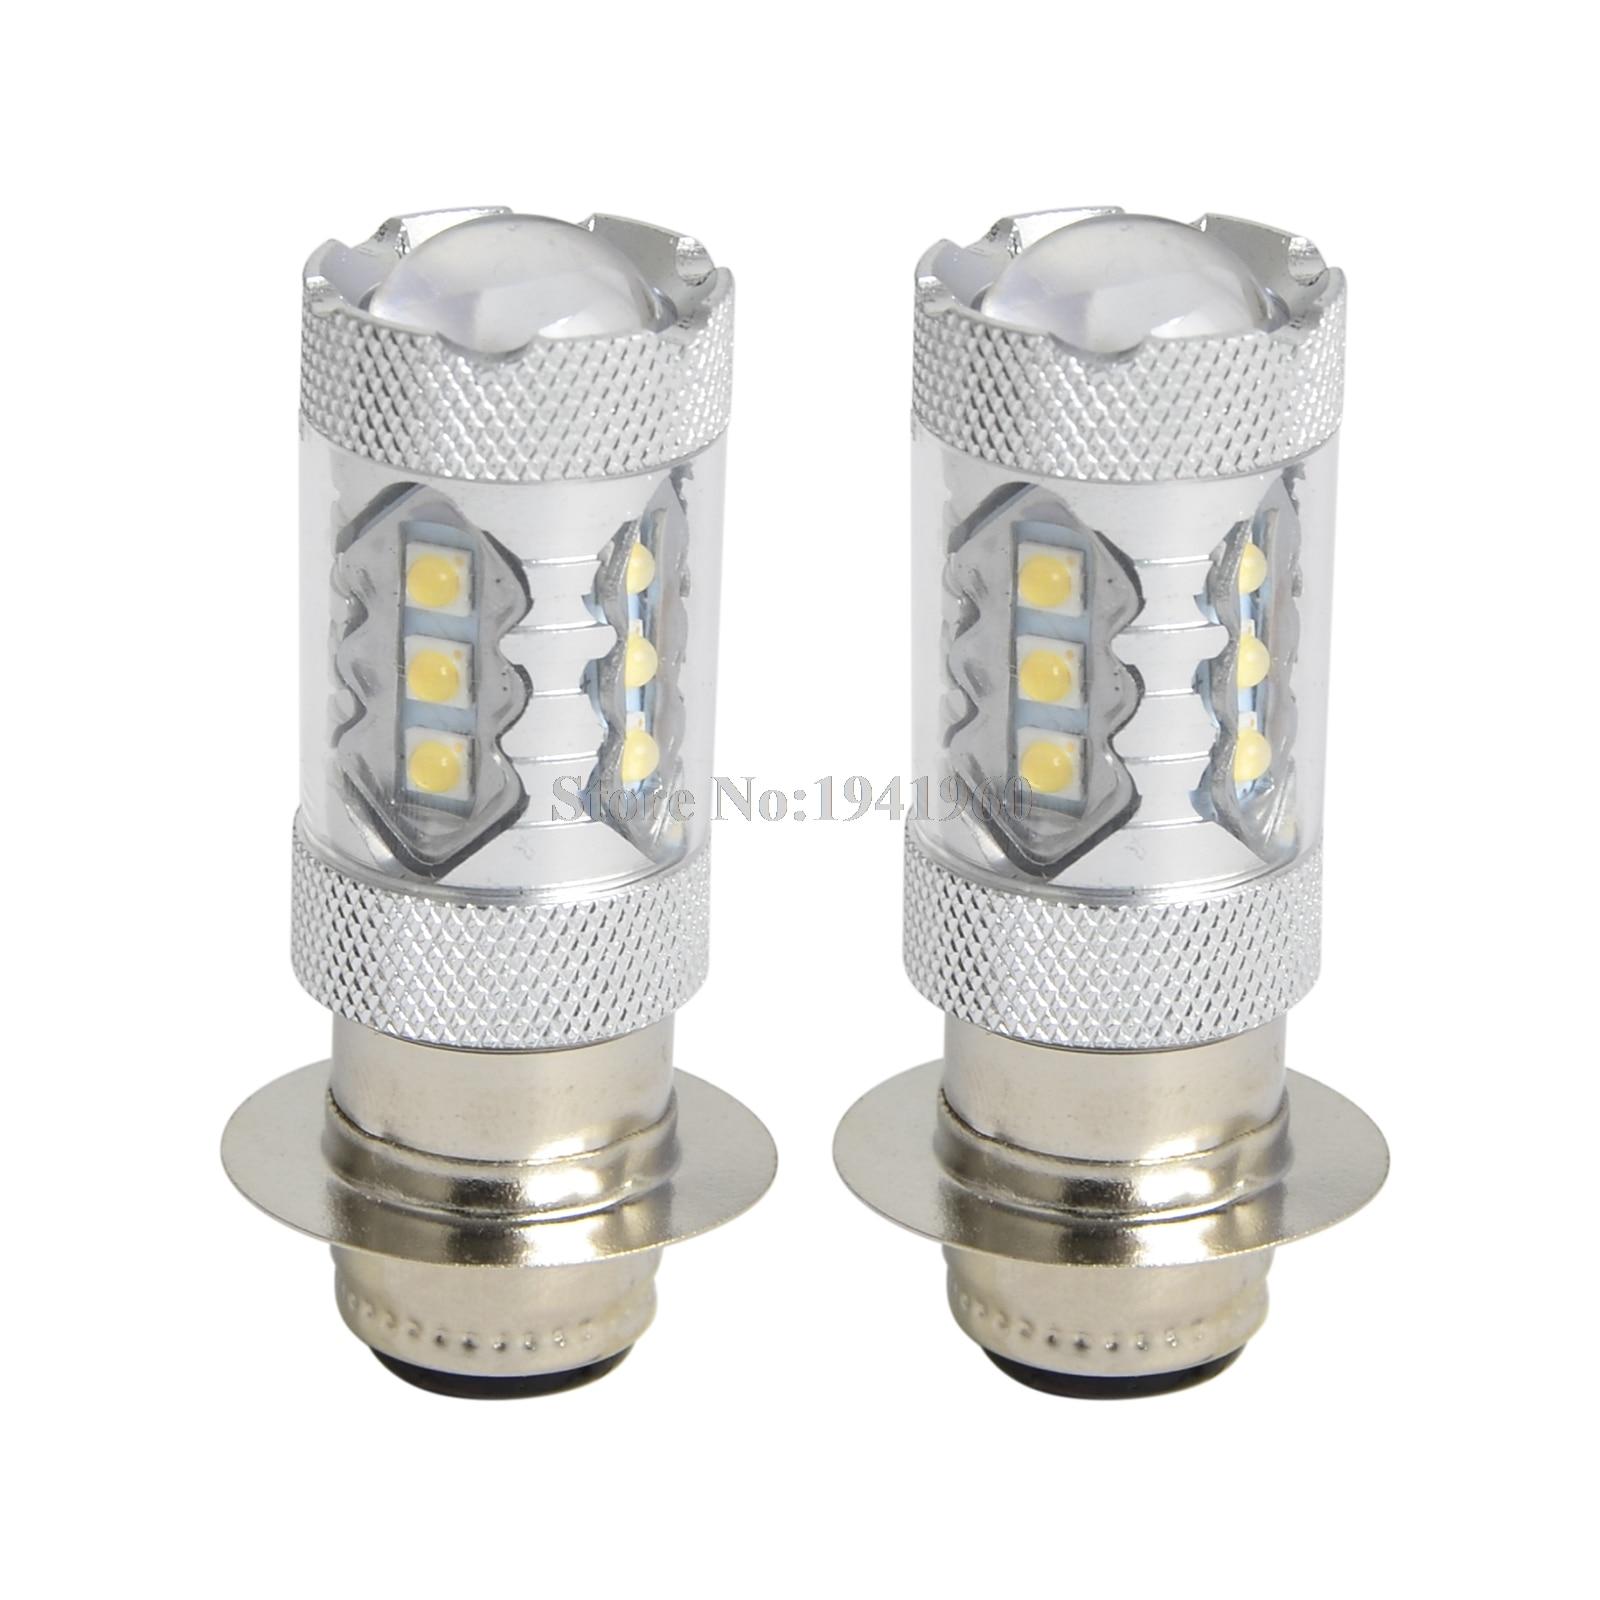 For Yamaha YFM250 Moto-4 Halogen Headlight Bulbs 35W 12V ATV 1989 1990 1991 2PCS